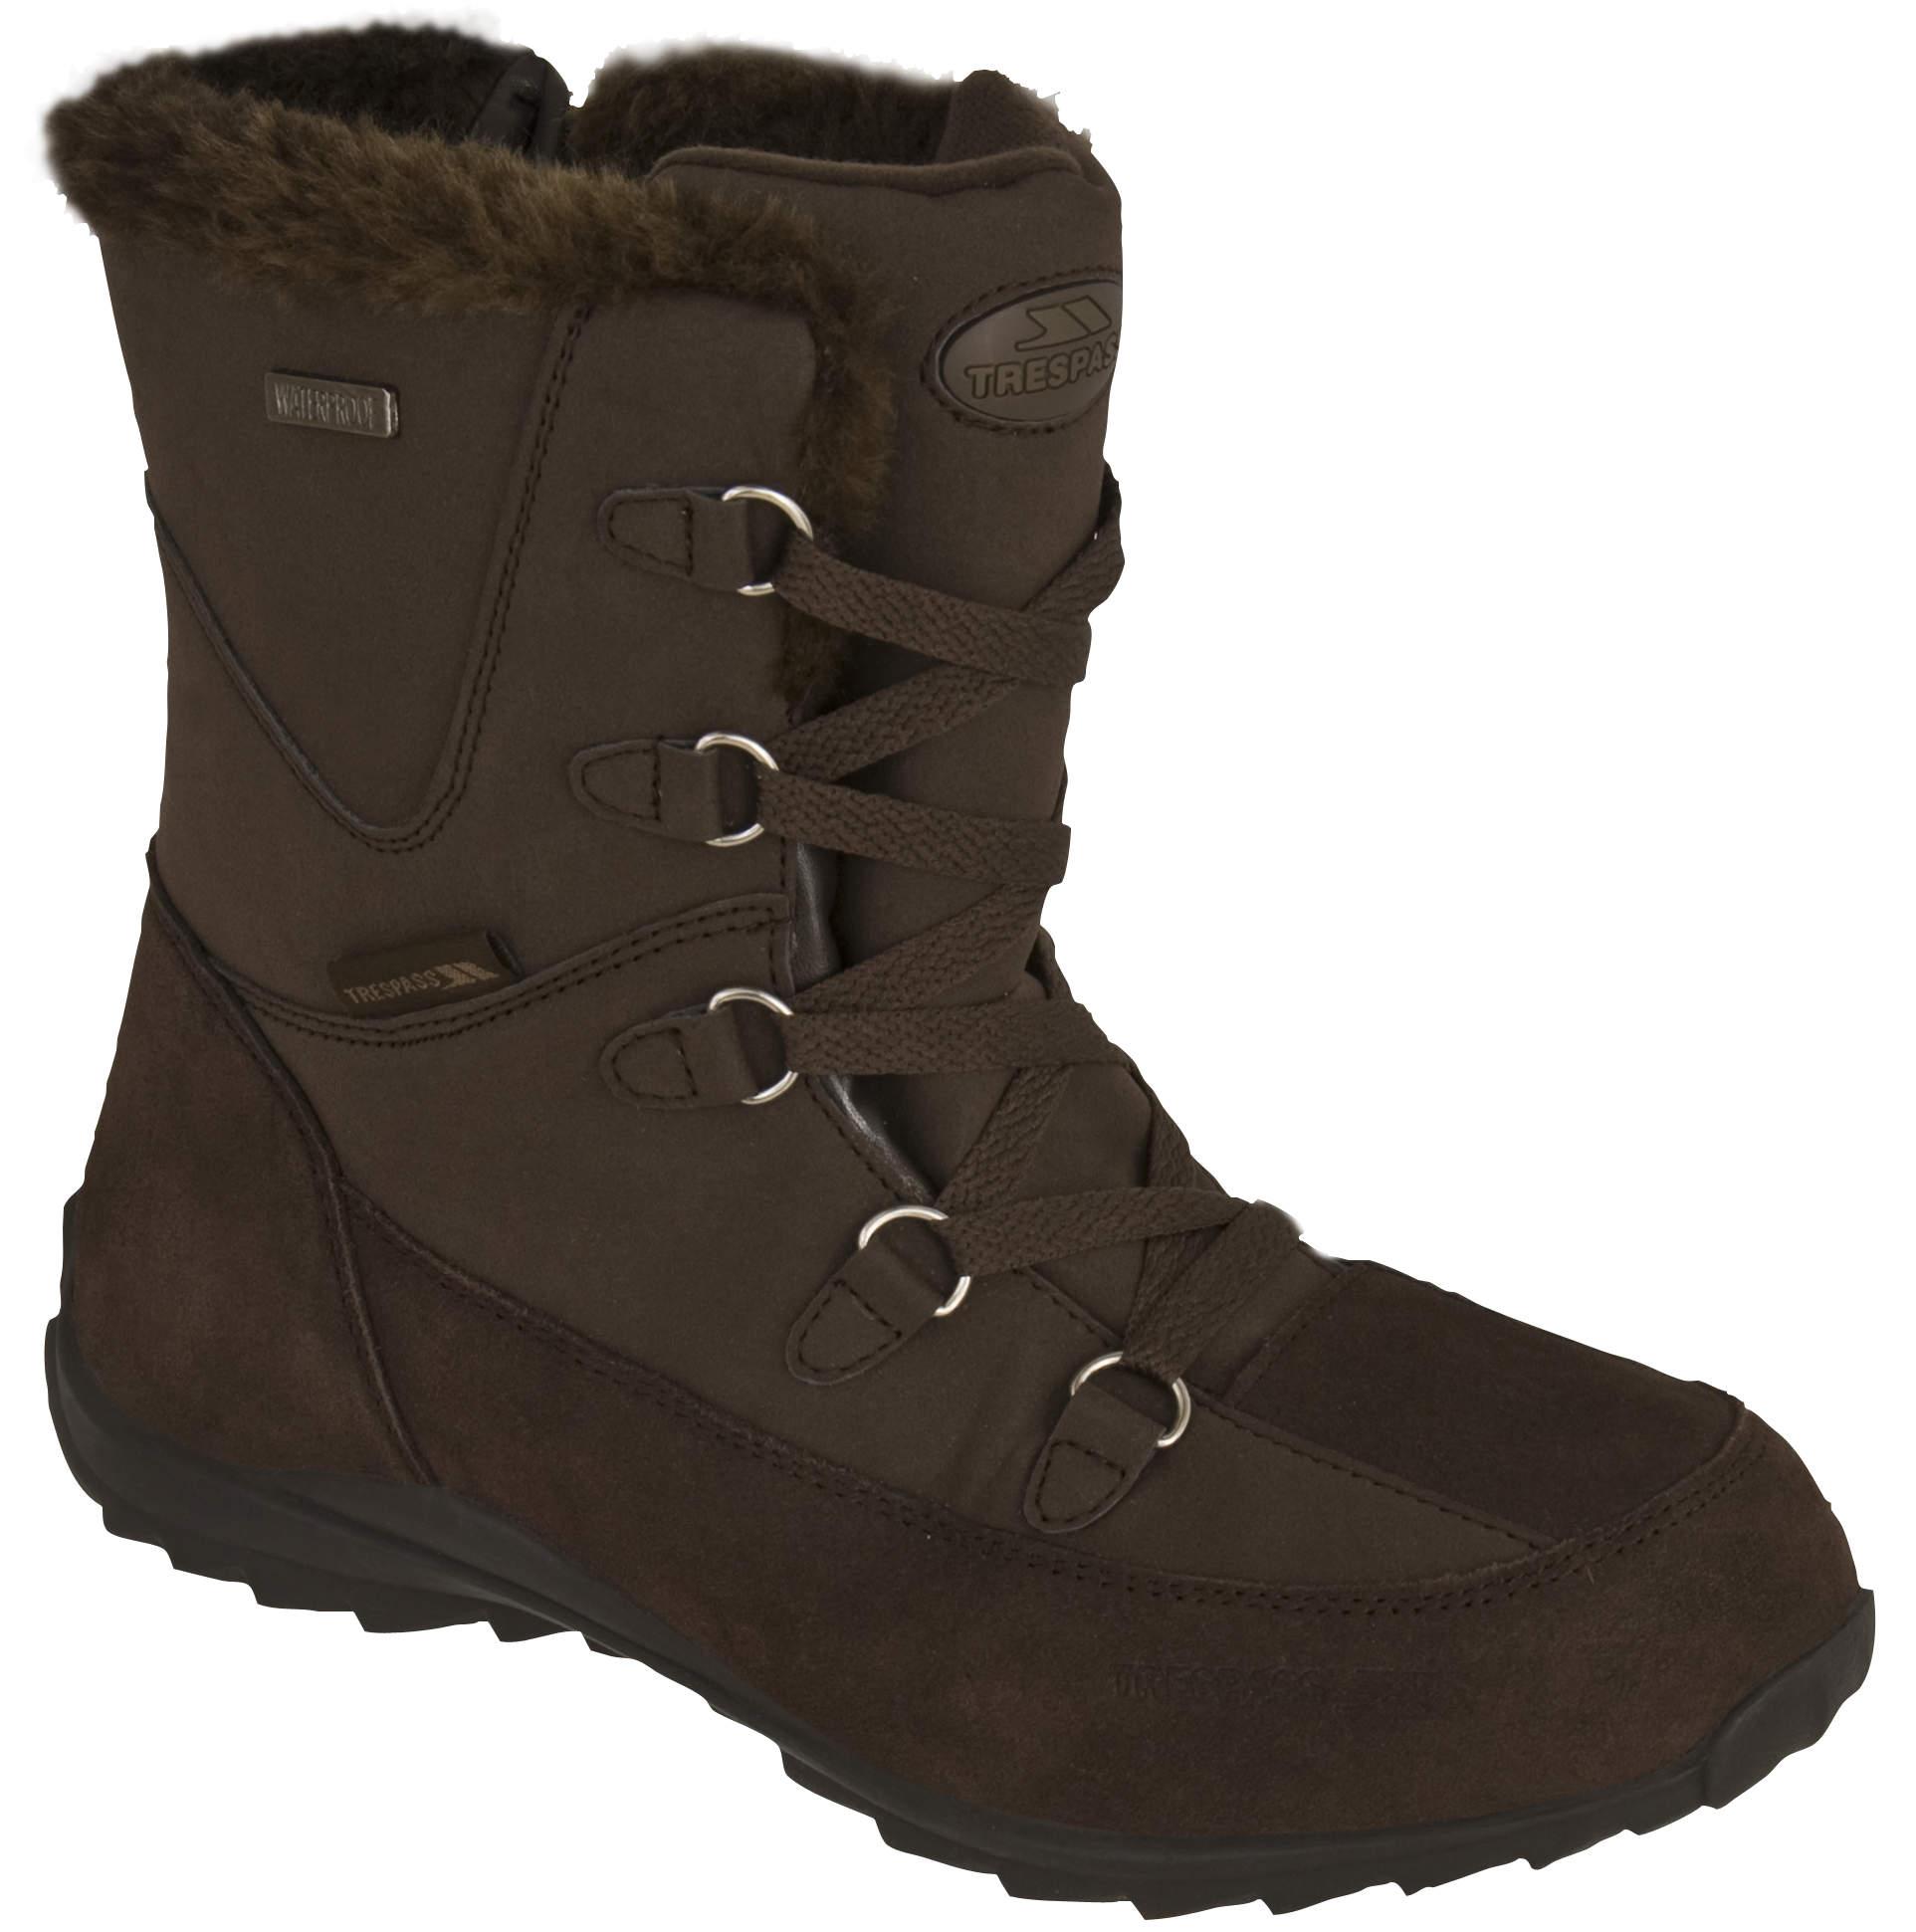 trespass zima womens waterproof winter snow shoes